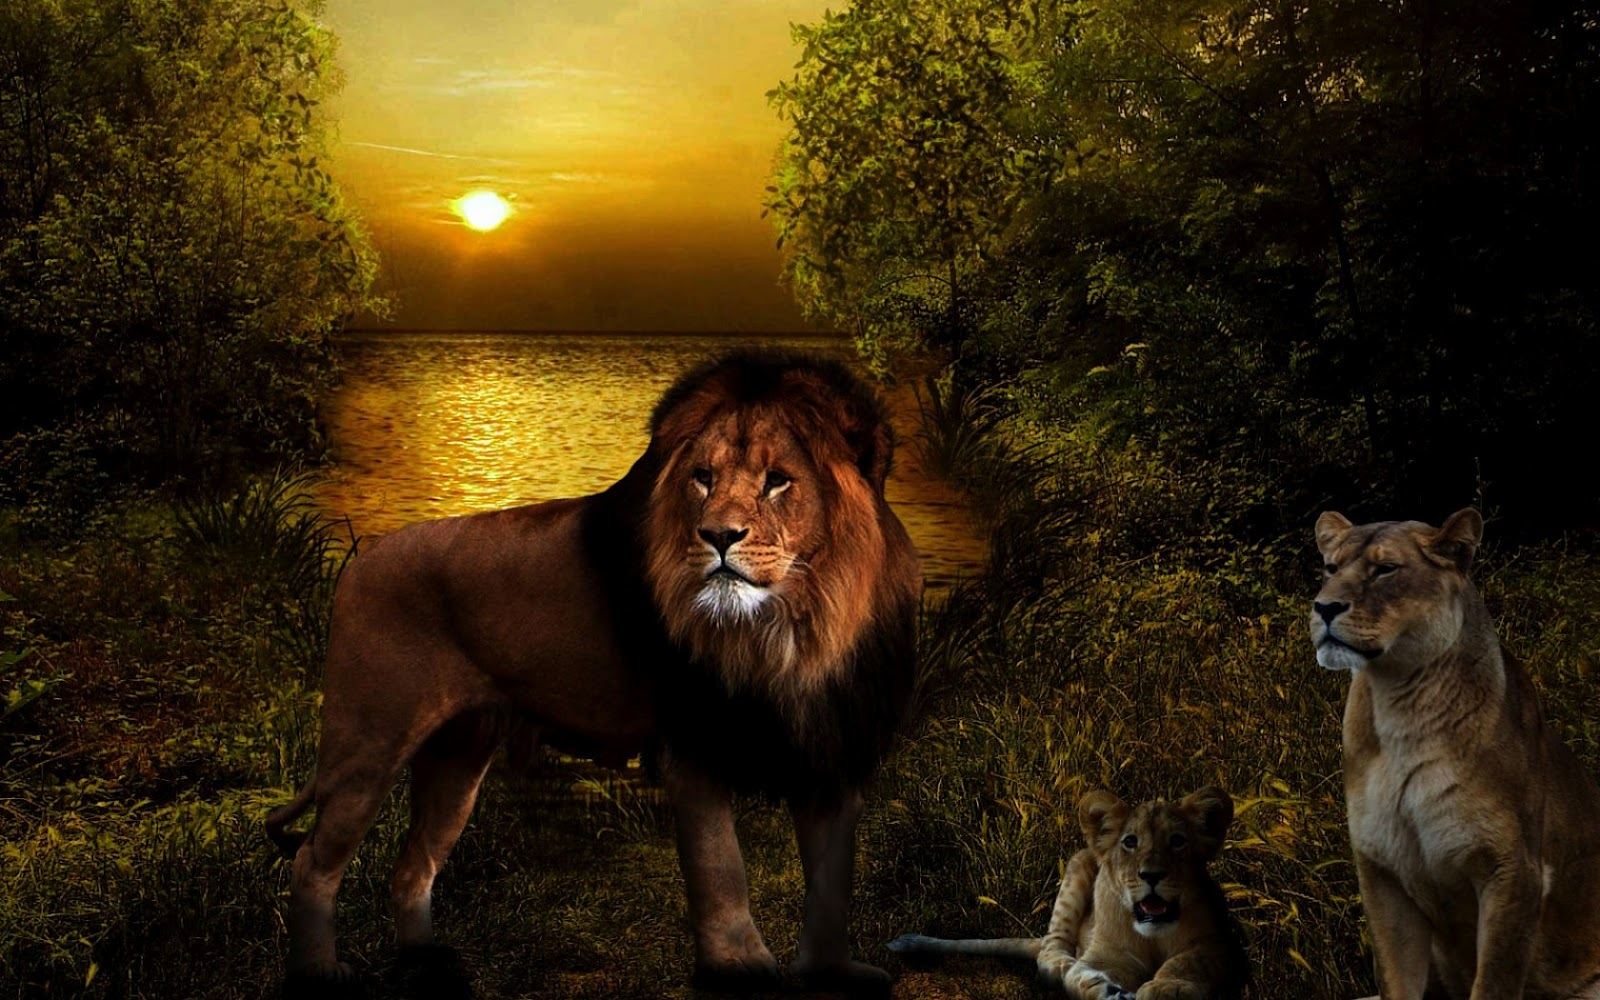 Lion family wallpaper - photo#52